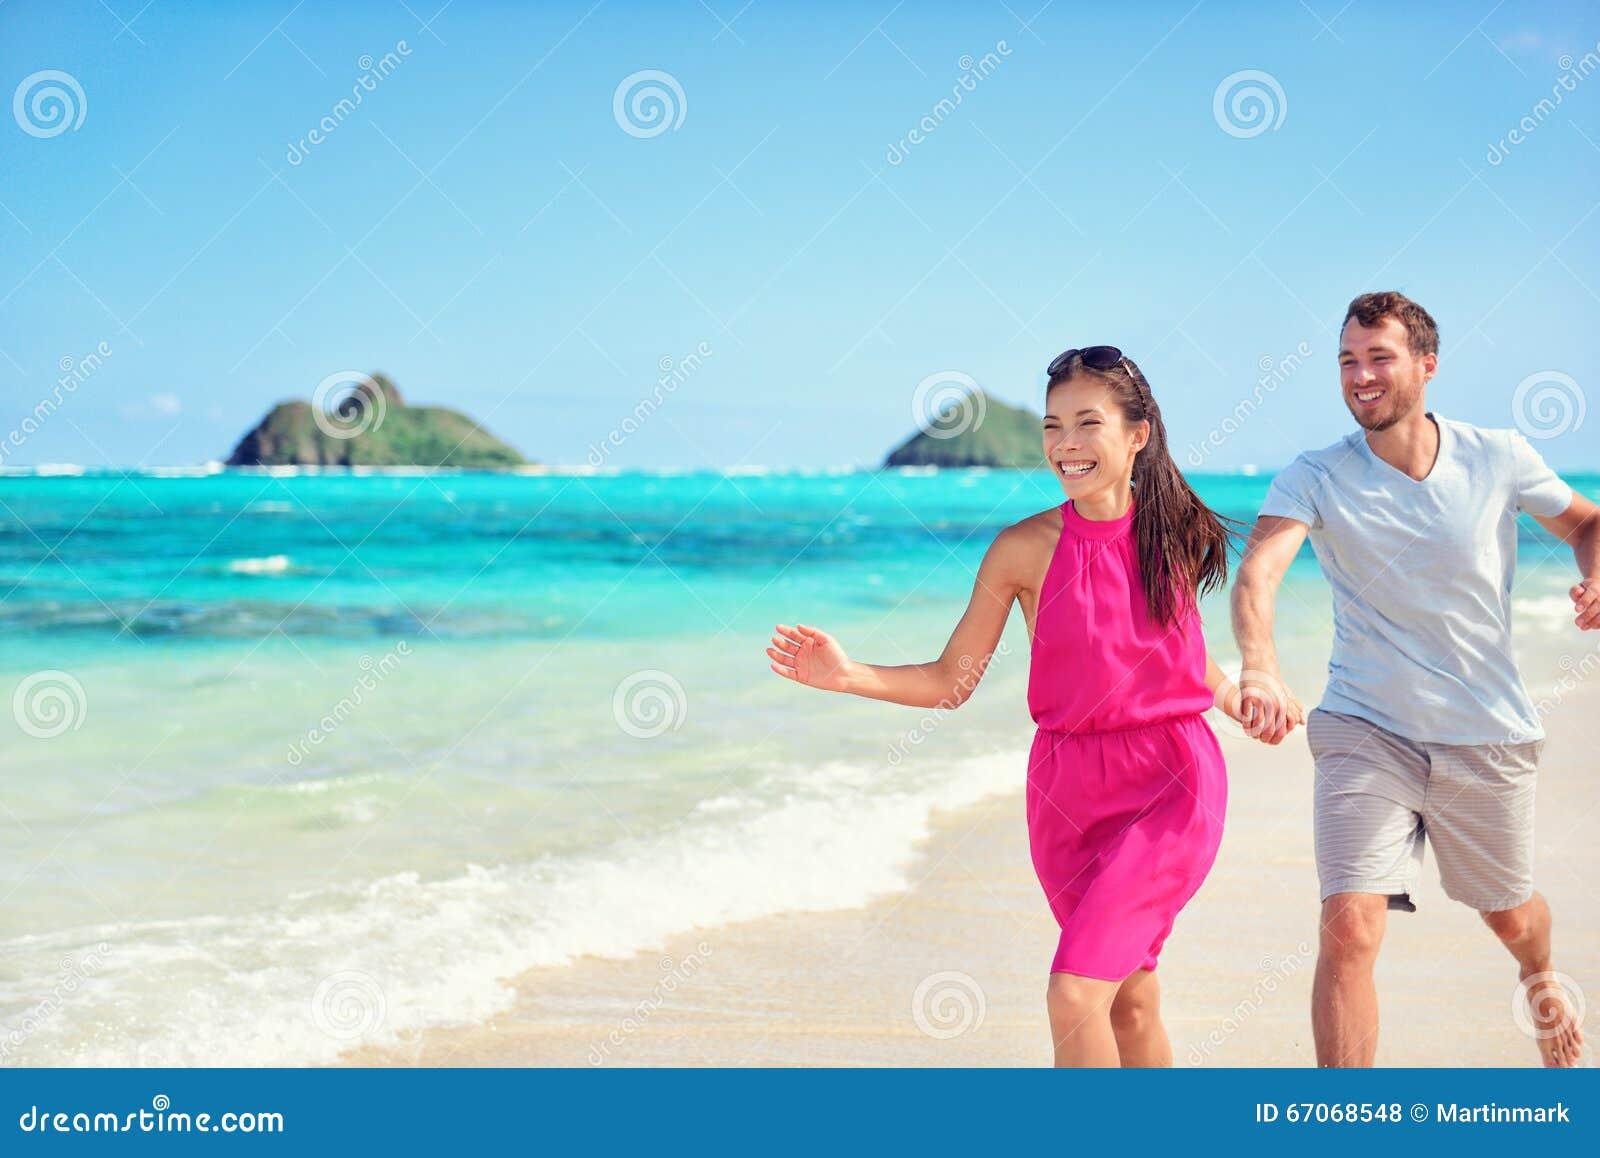 Happy Beach Fun Couple On Summer Vacation Getaway Stock Photo Image 67068548